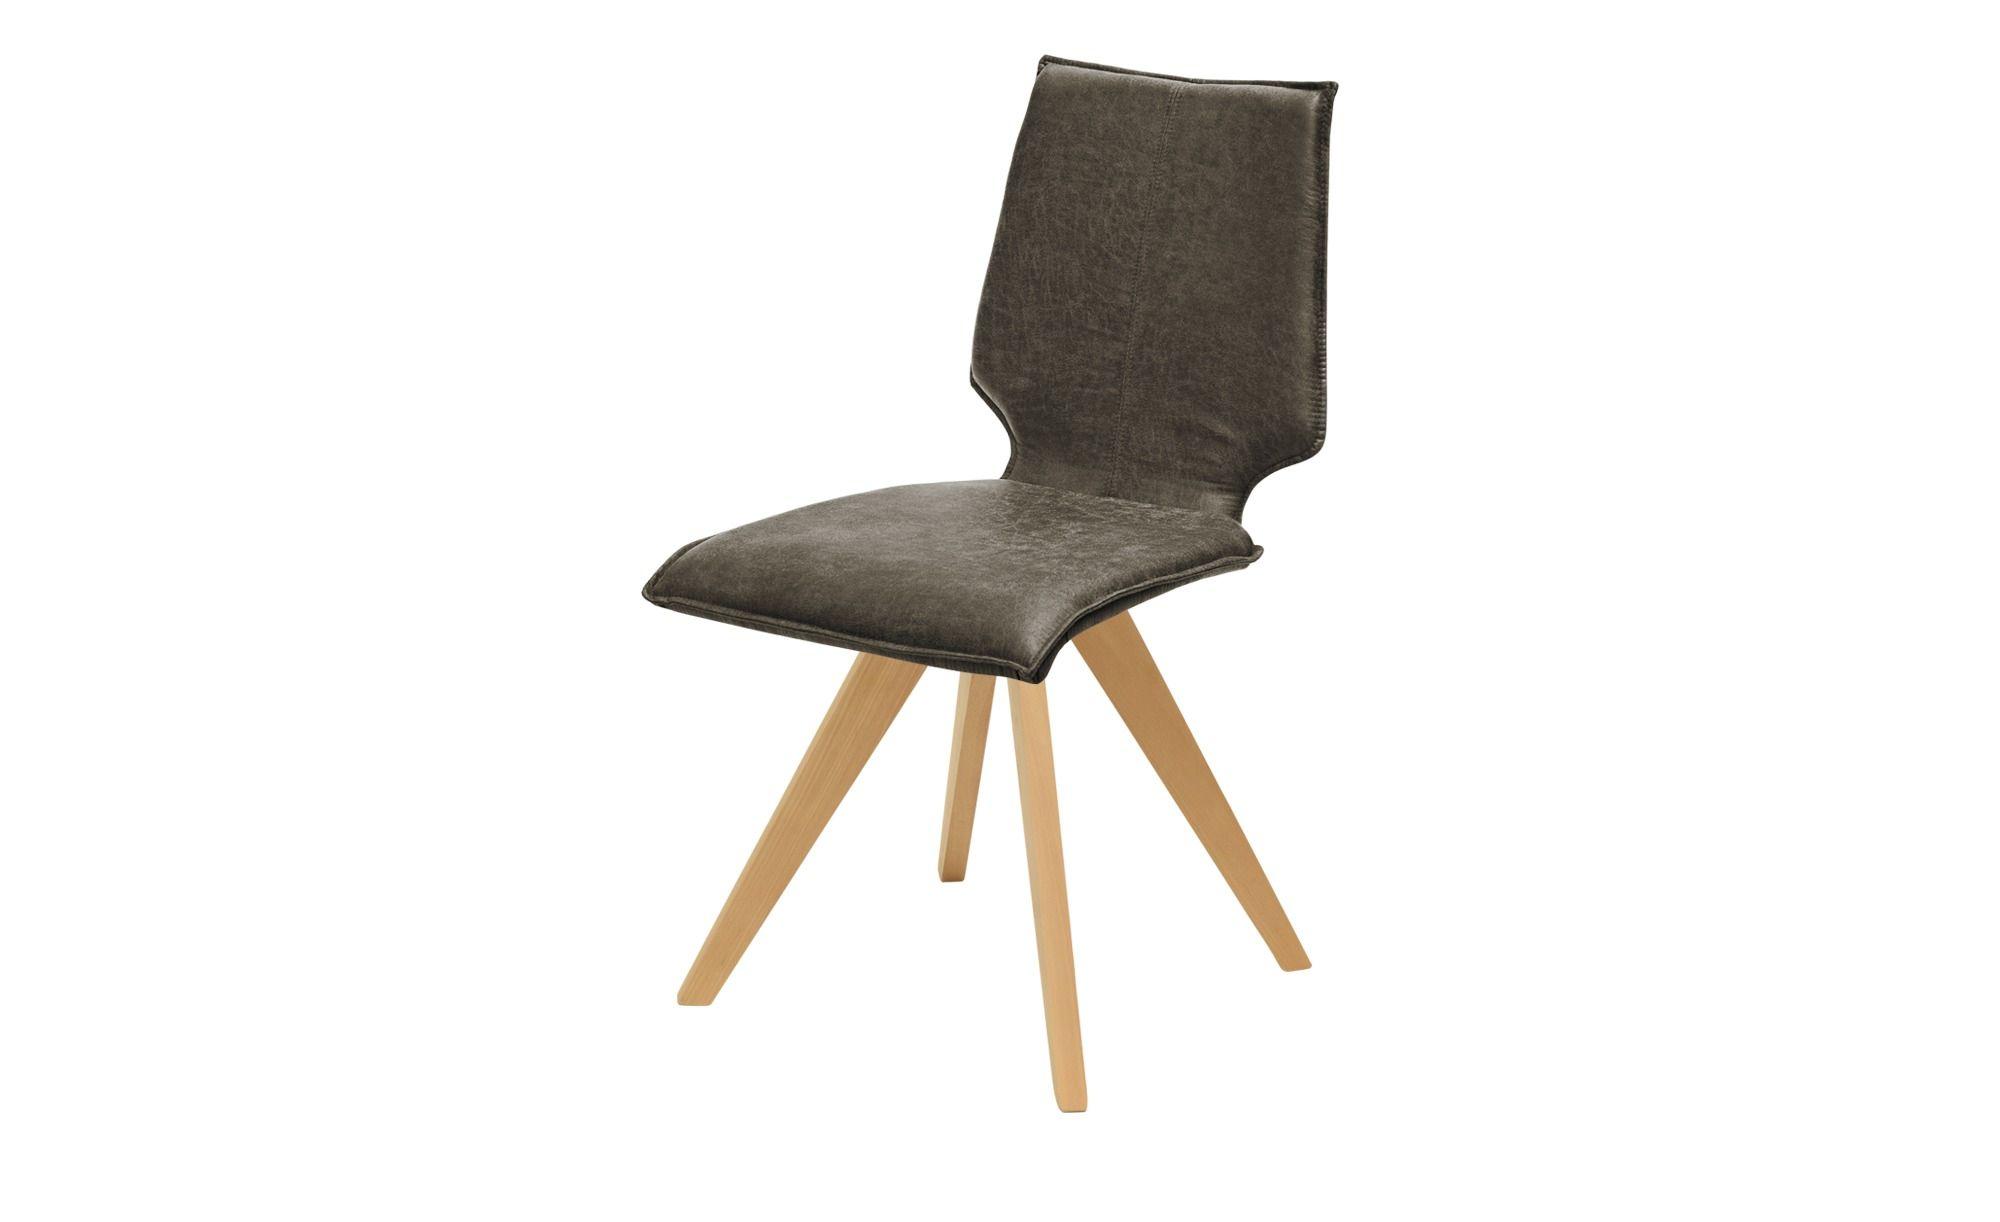 Woodford Stuhl Bari Esszimmerstuhle Stuhle Stuhle Gunstig